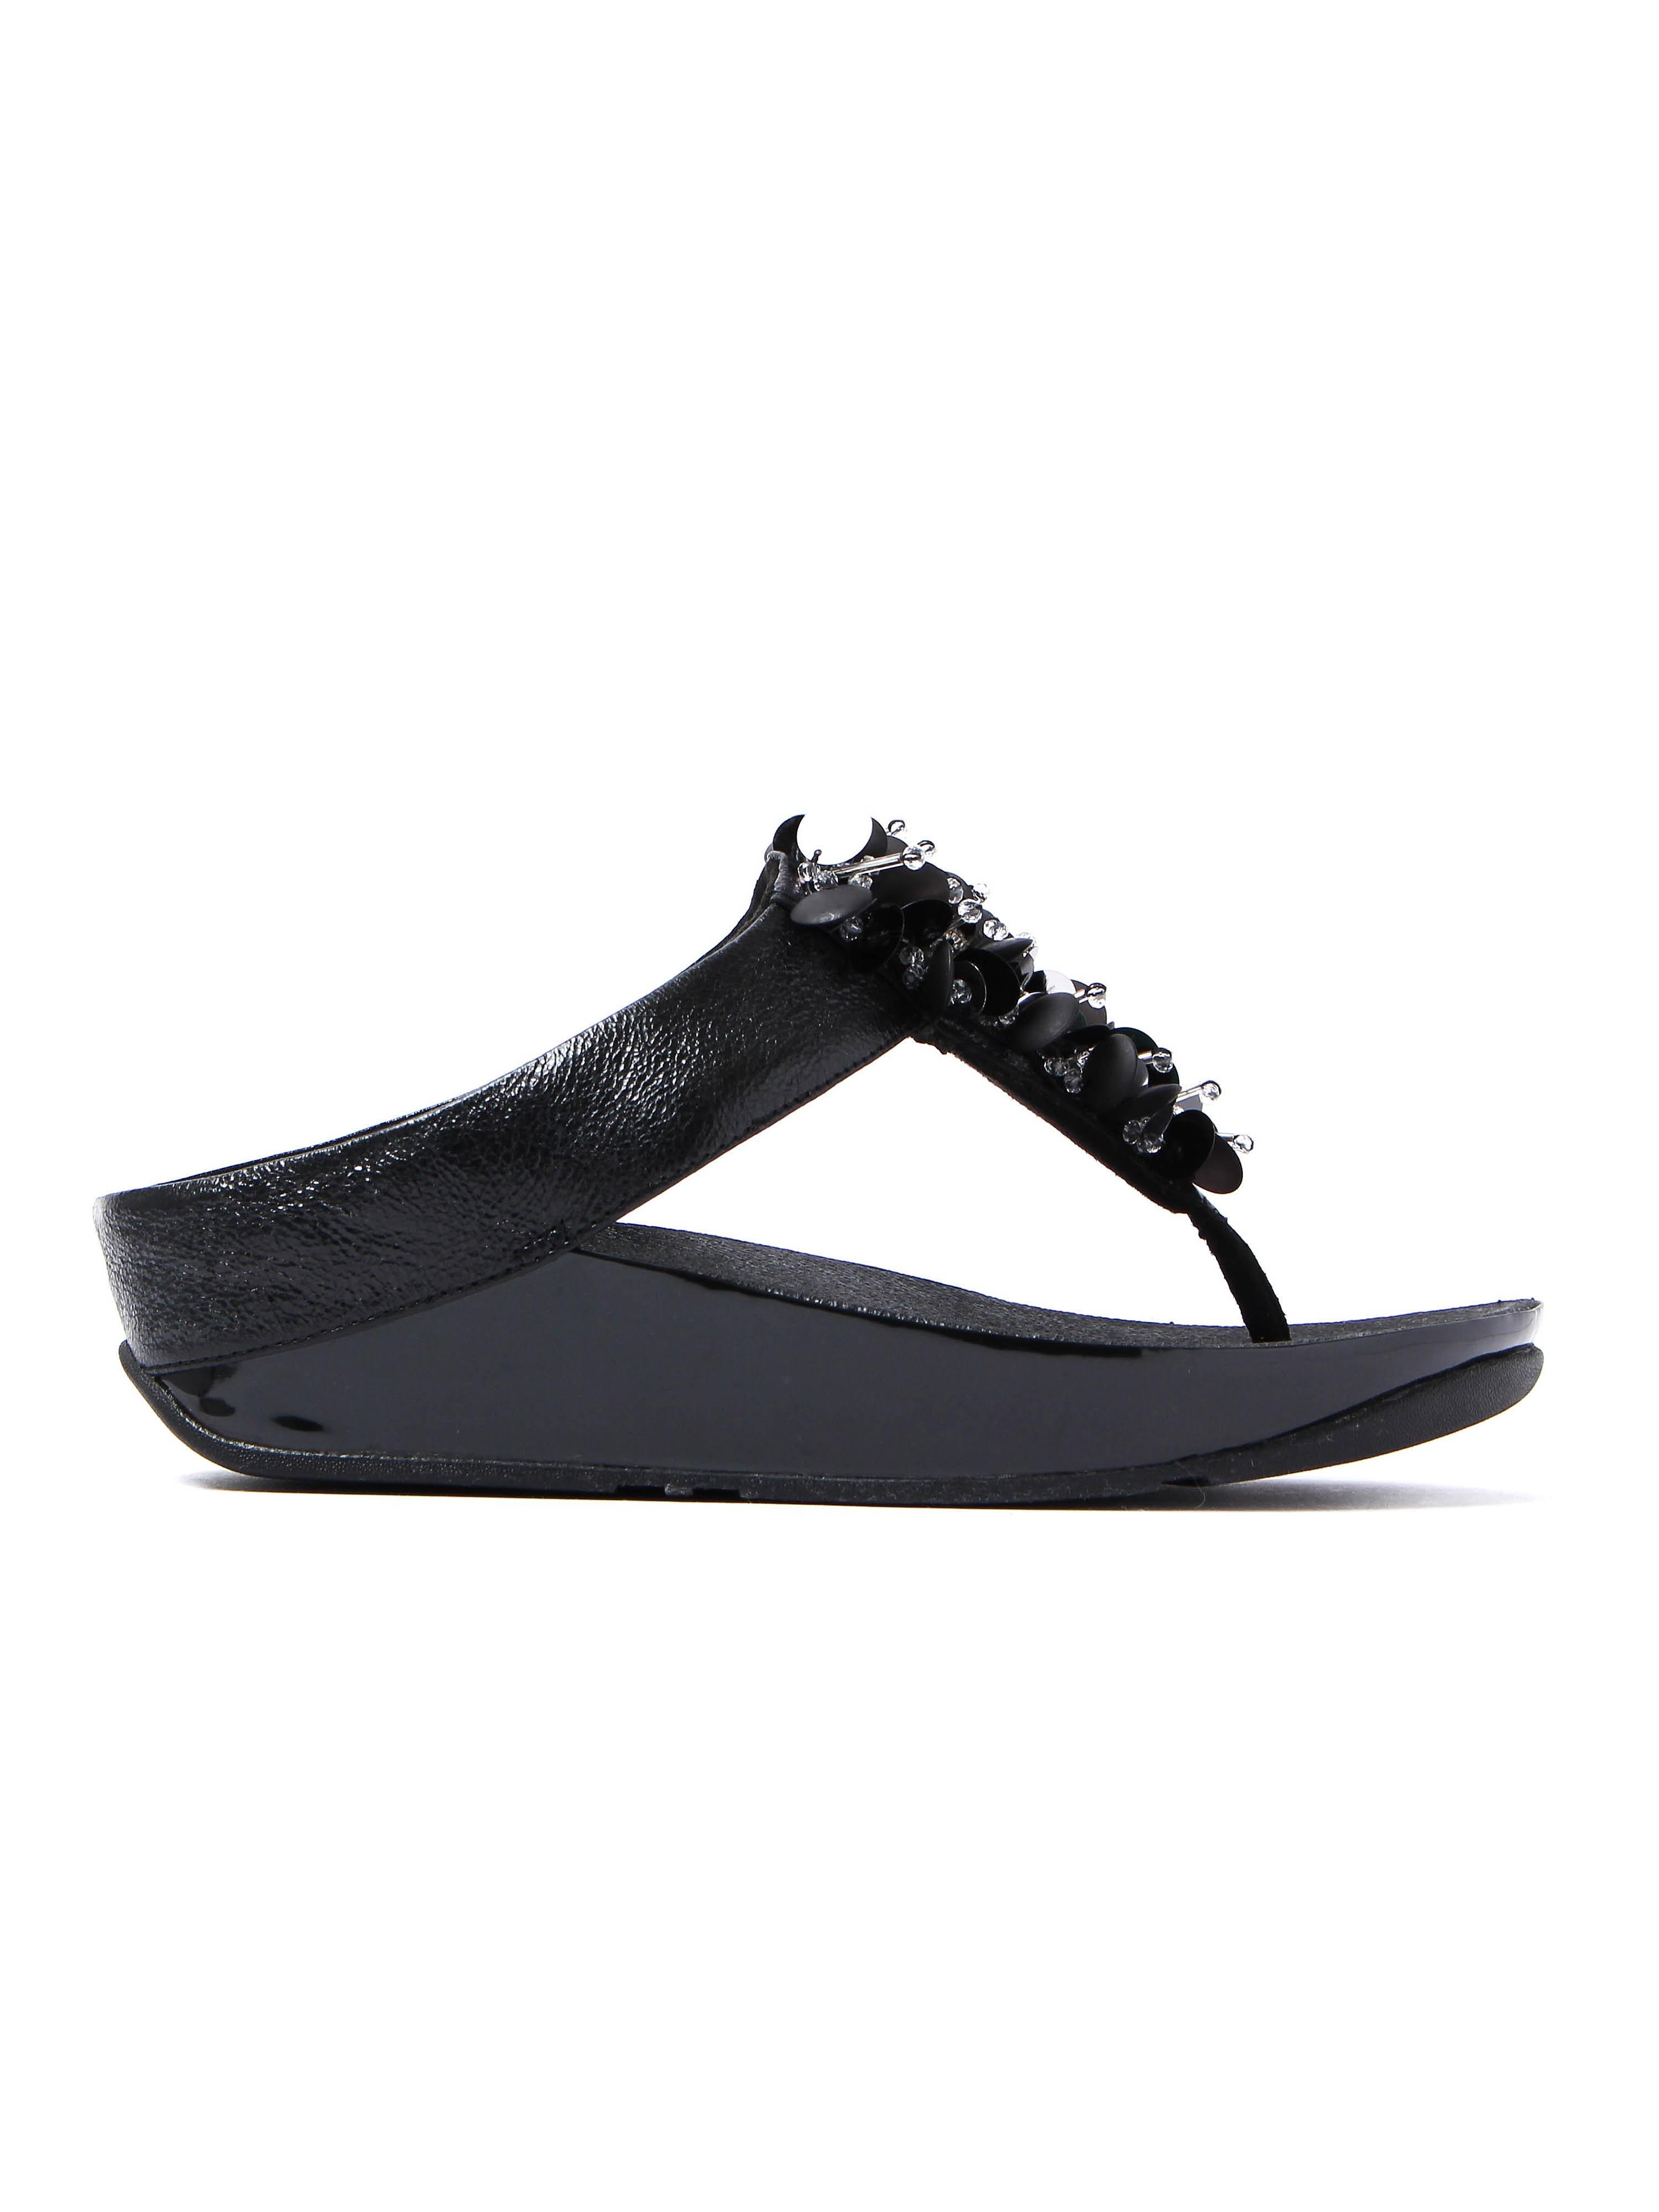 FitFlop Women's Boogaloo Toe-Post Sandals - Black